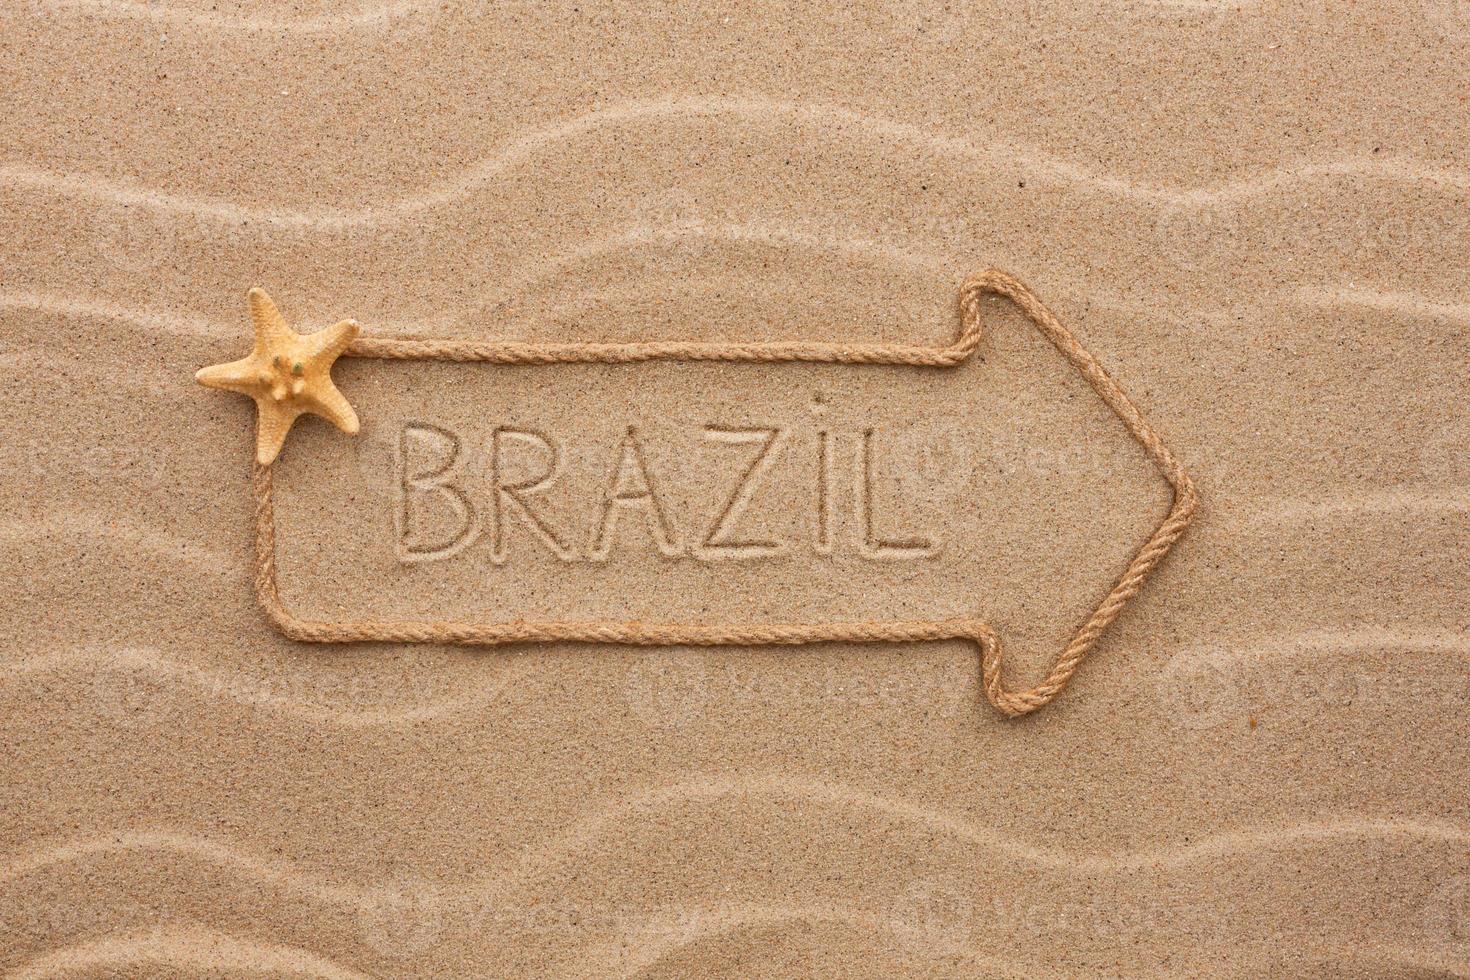 corda freccia con la parola brasile sulla sabbia foto